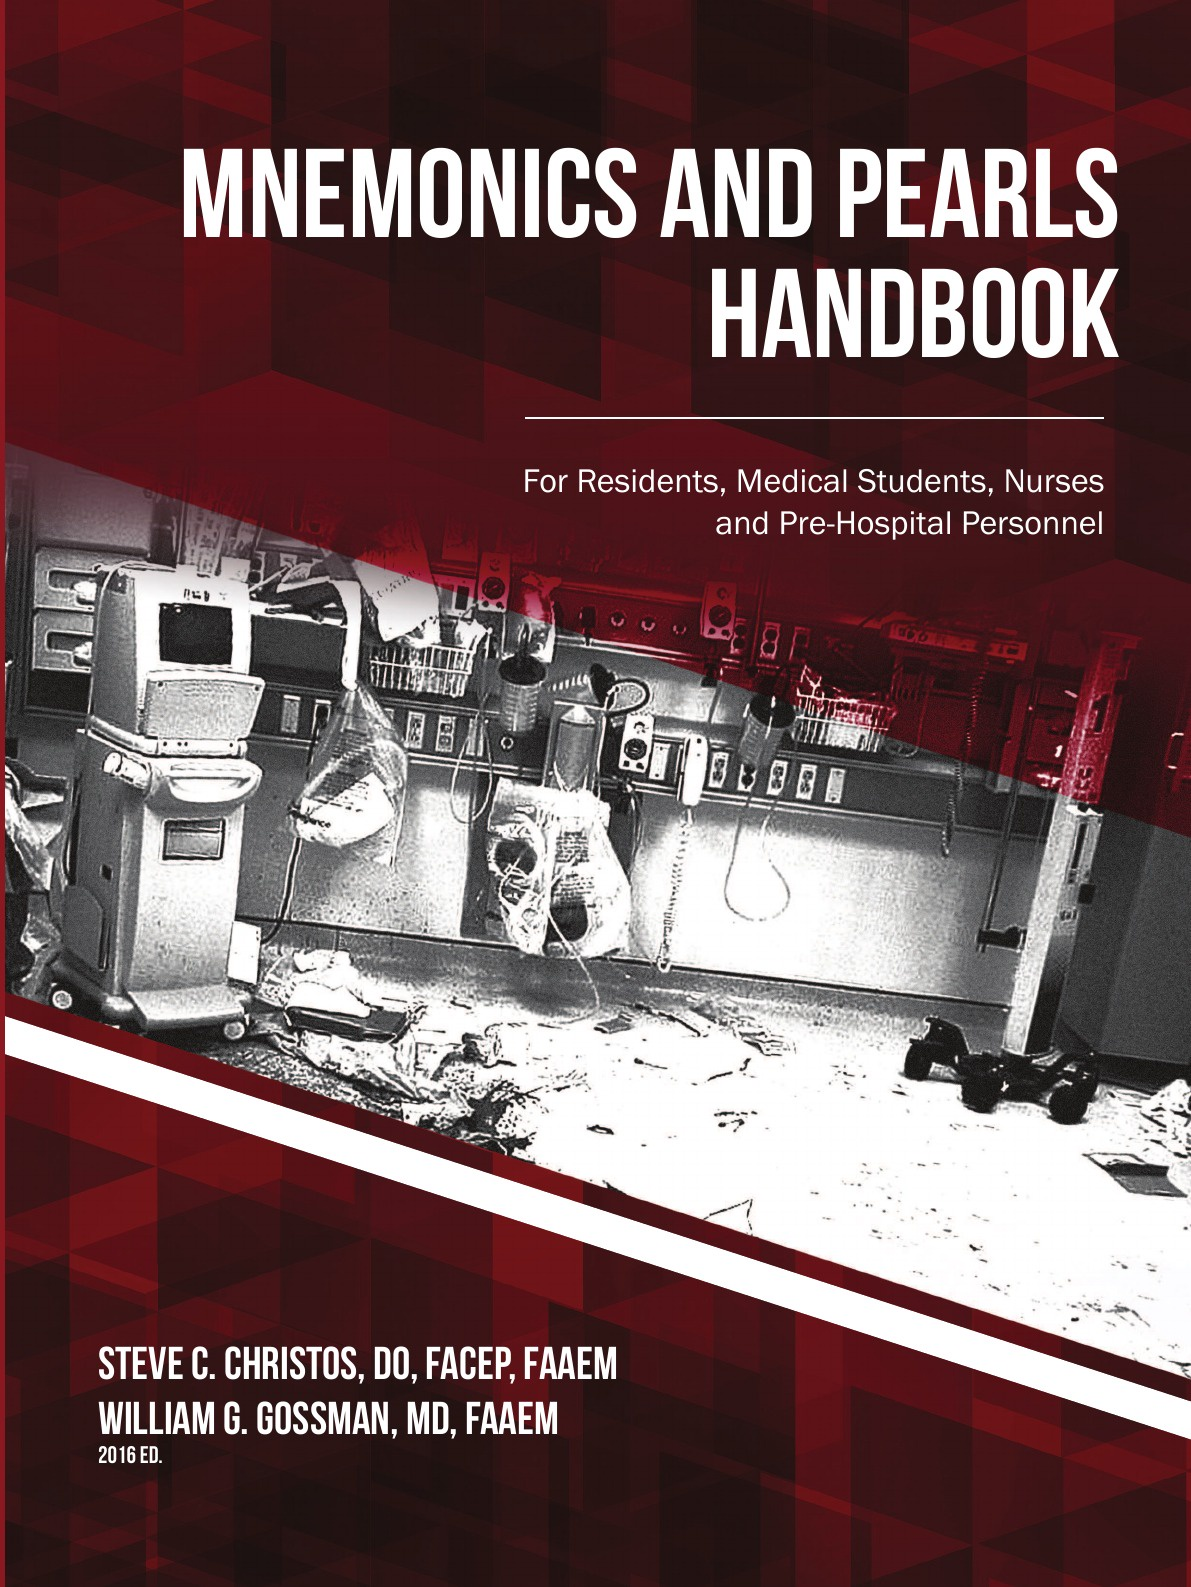 Steve Christos, William Gossman Mnemonics and Pearls